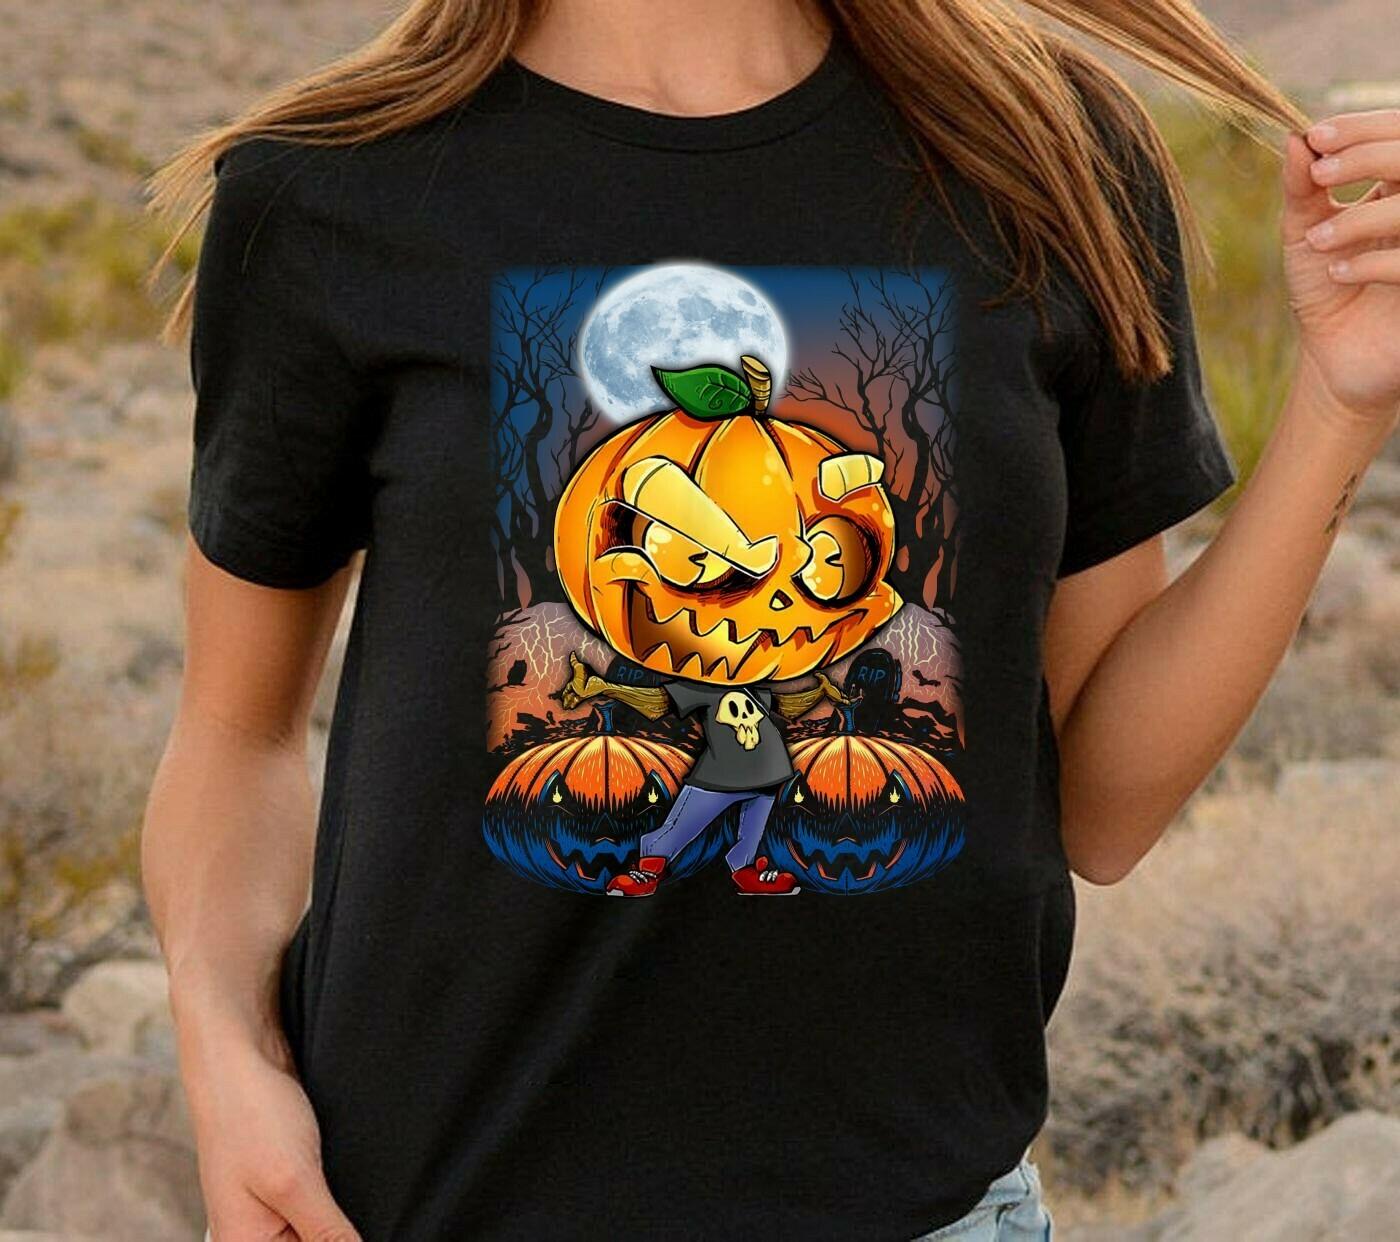 Pumpkin Boy gift shirt for Lovers Halloween day, Boys Pumpkin Shirt, Pumpkin not So Scary Gift Idea Long Sleeve Sweatshirt Hoodie Jolly Family Gifts